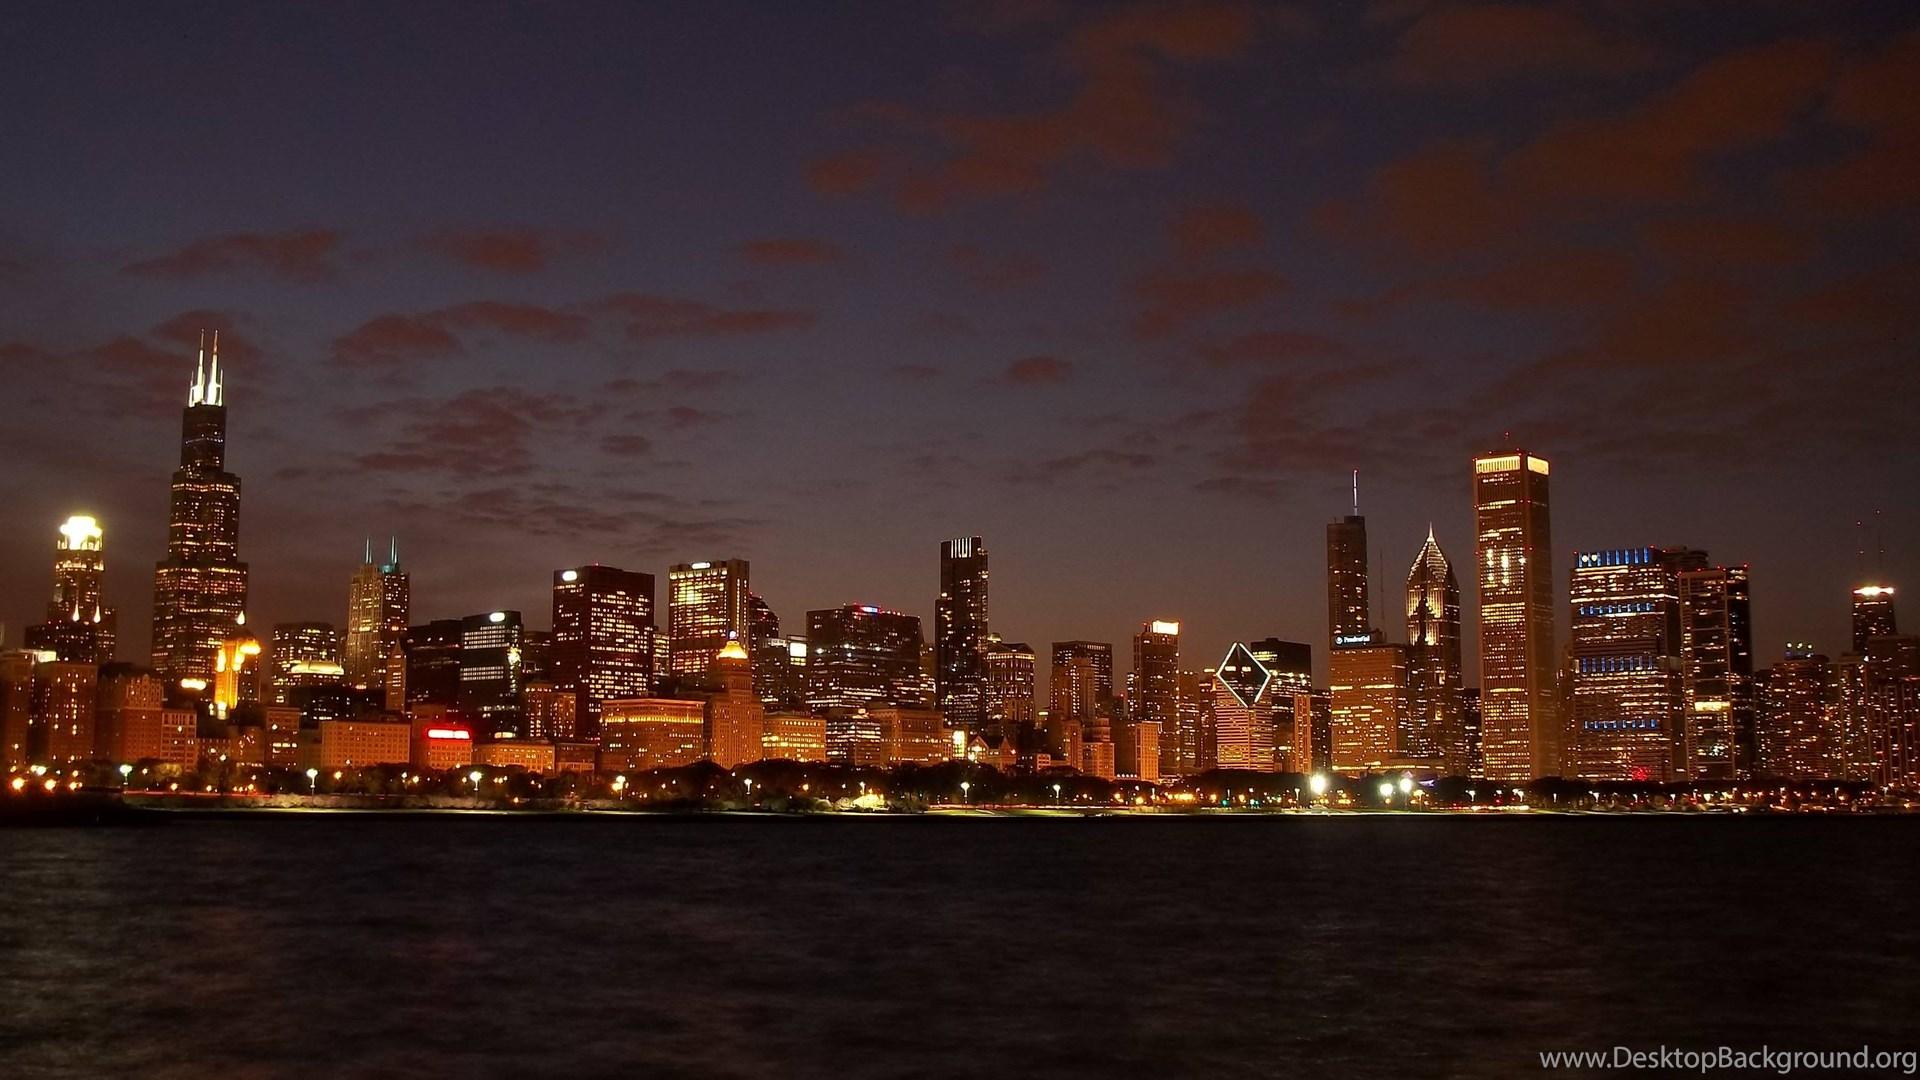 Pin chicago skyline wallpapers hd on pinterest chicago skyline desktop background - Chicago skyline wallpaper 1920x1080 ...